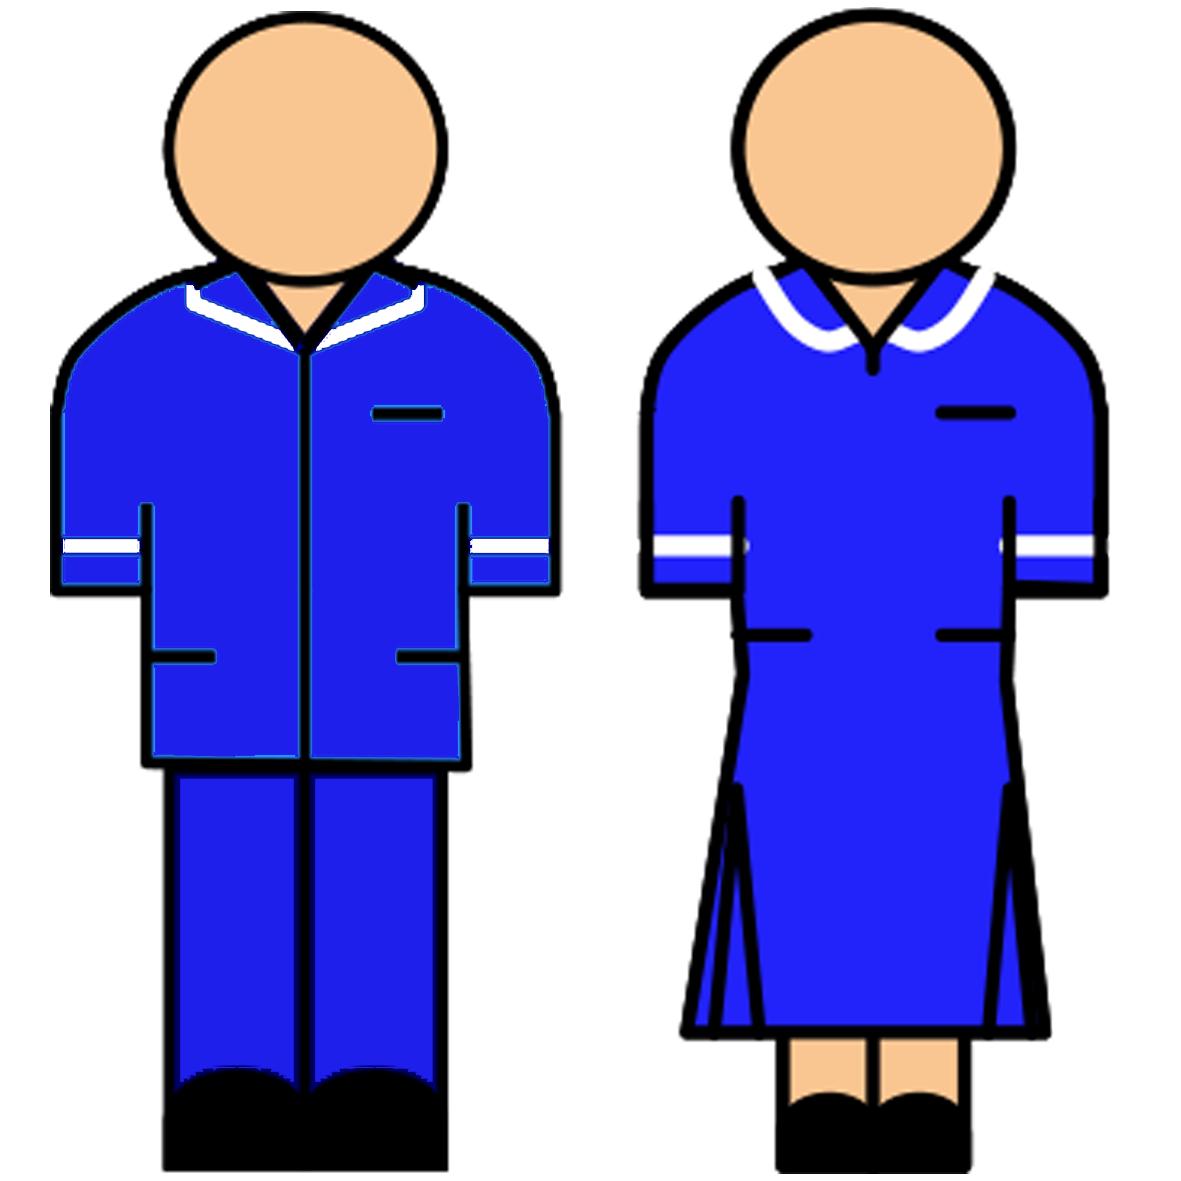 Blue uniform with white stripe